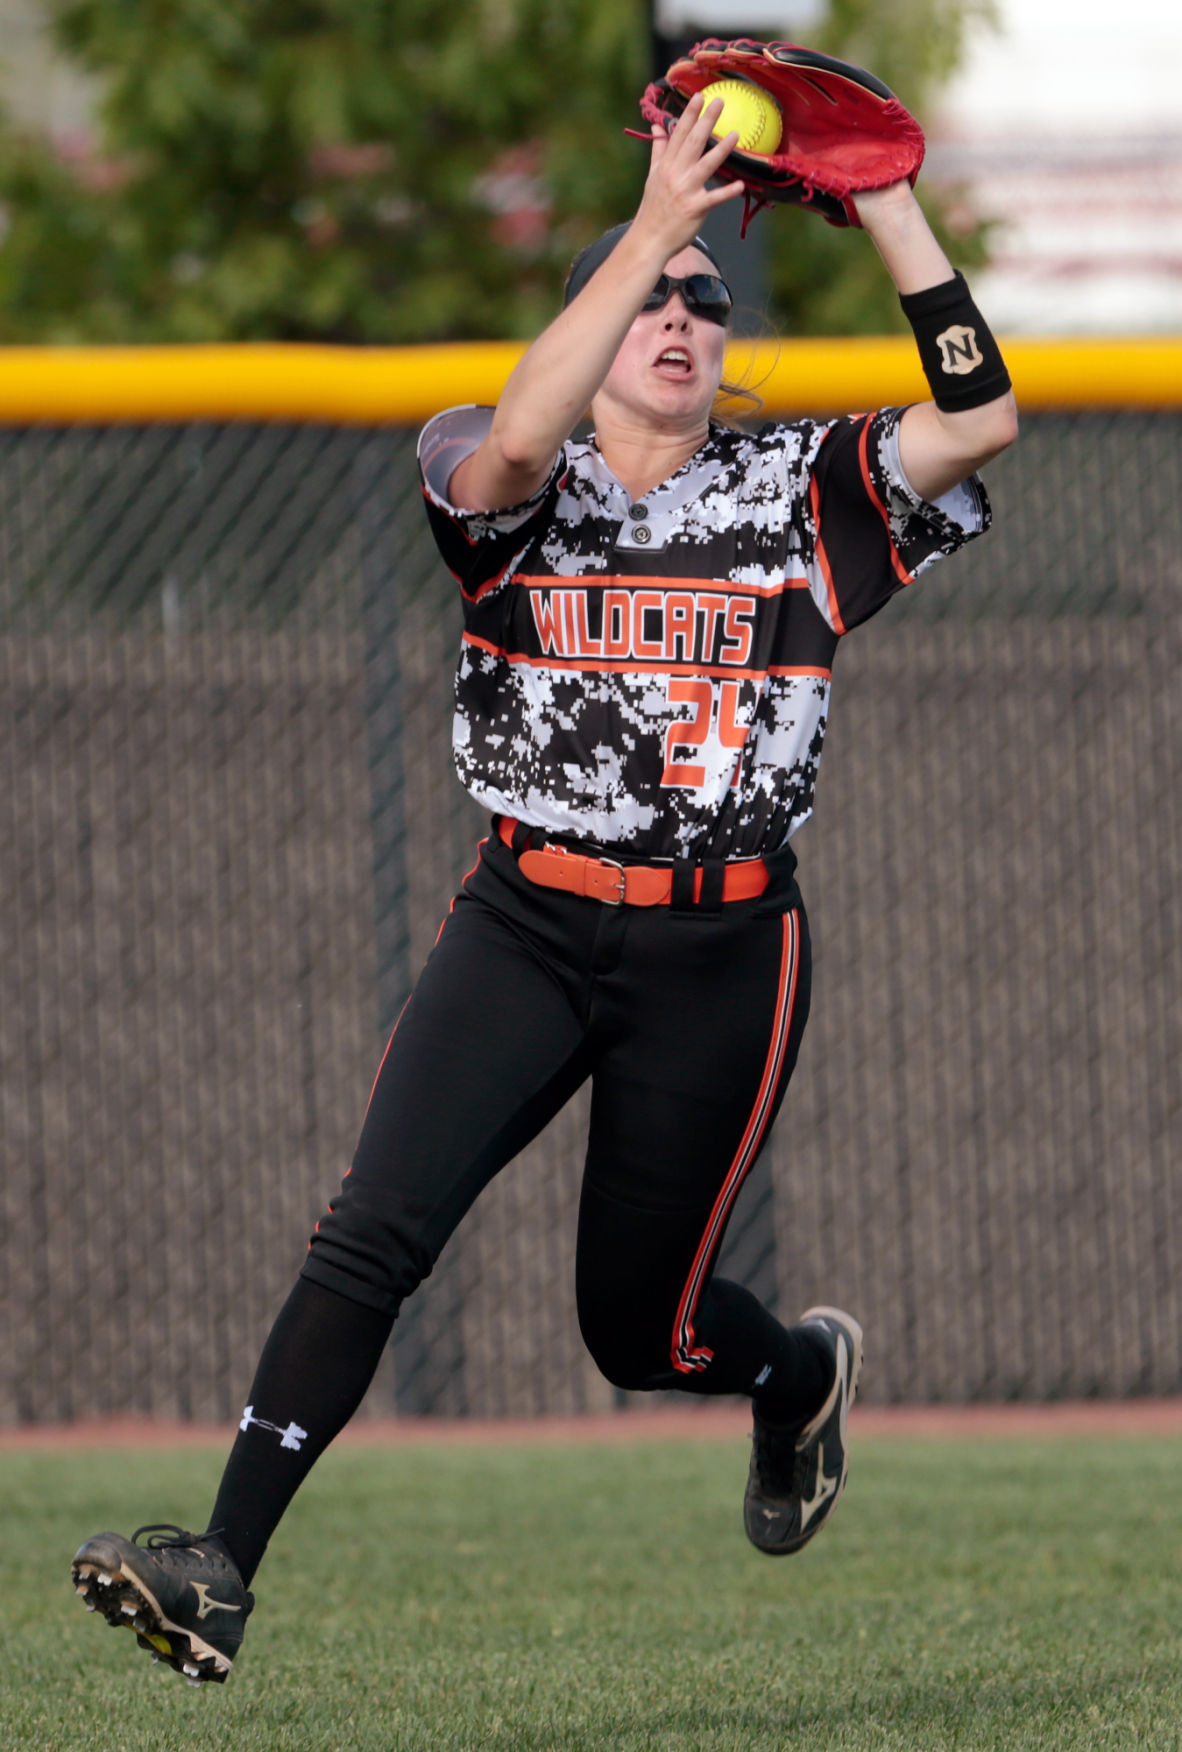 WIAA state softball photo: Verona's Molly McChesney